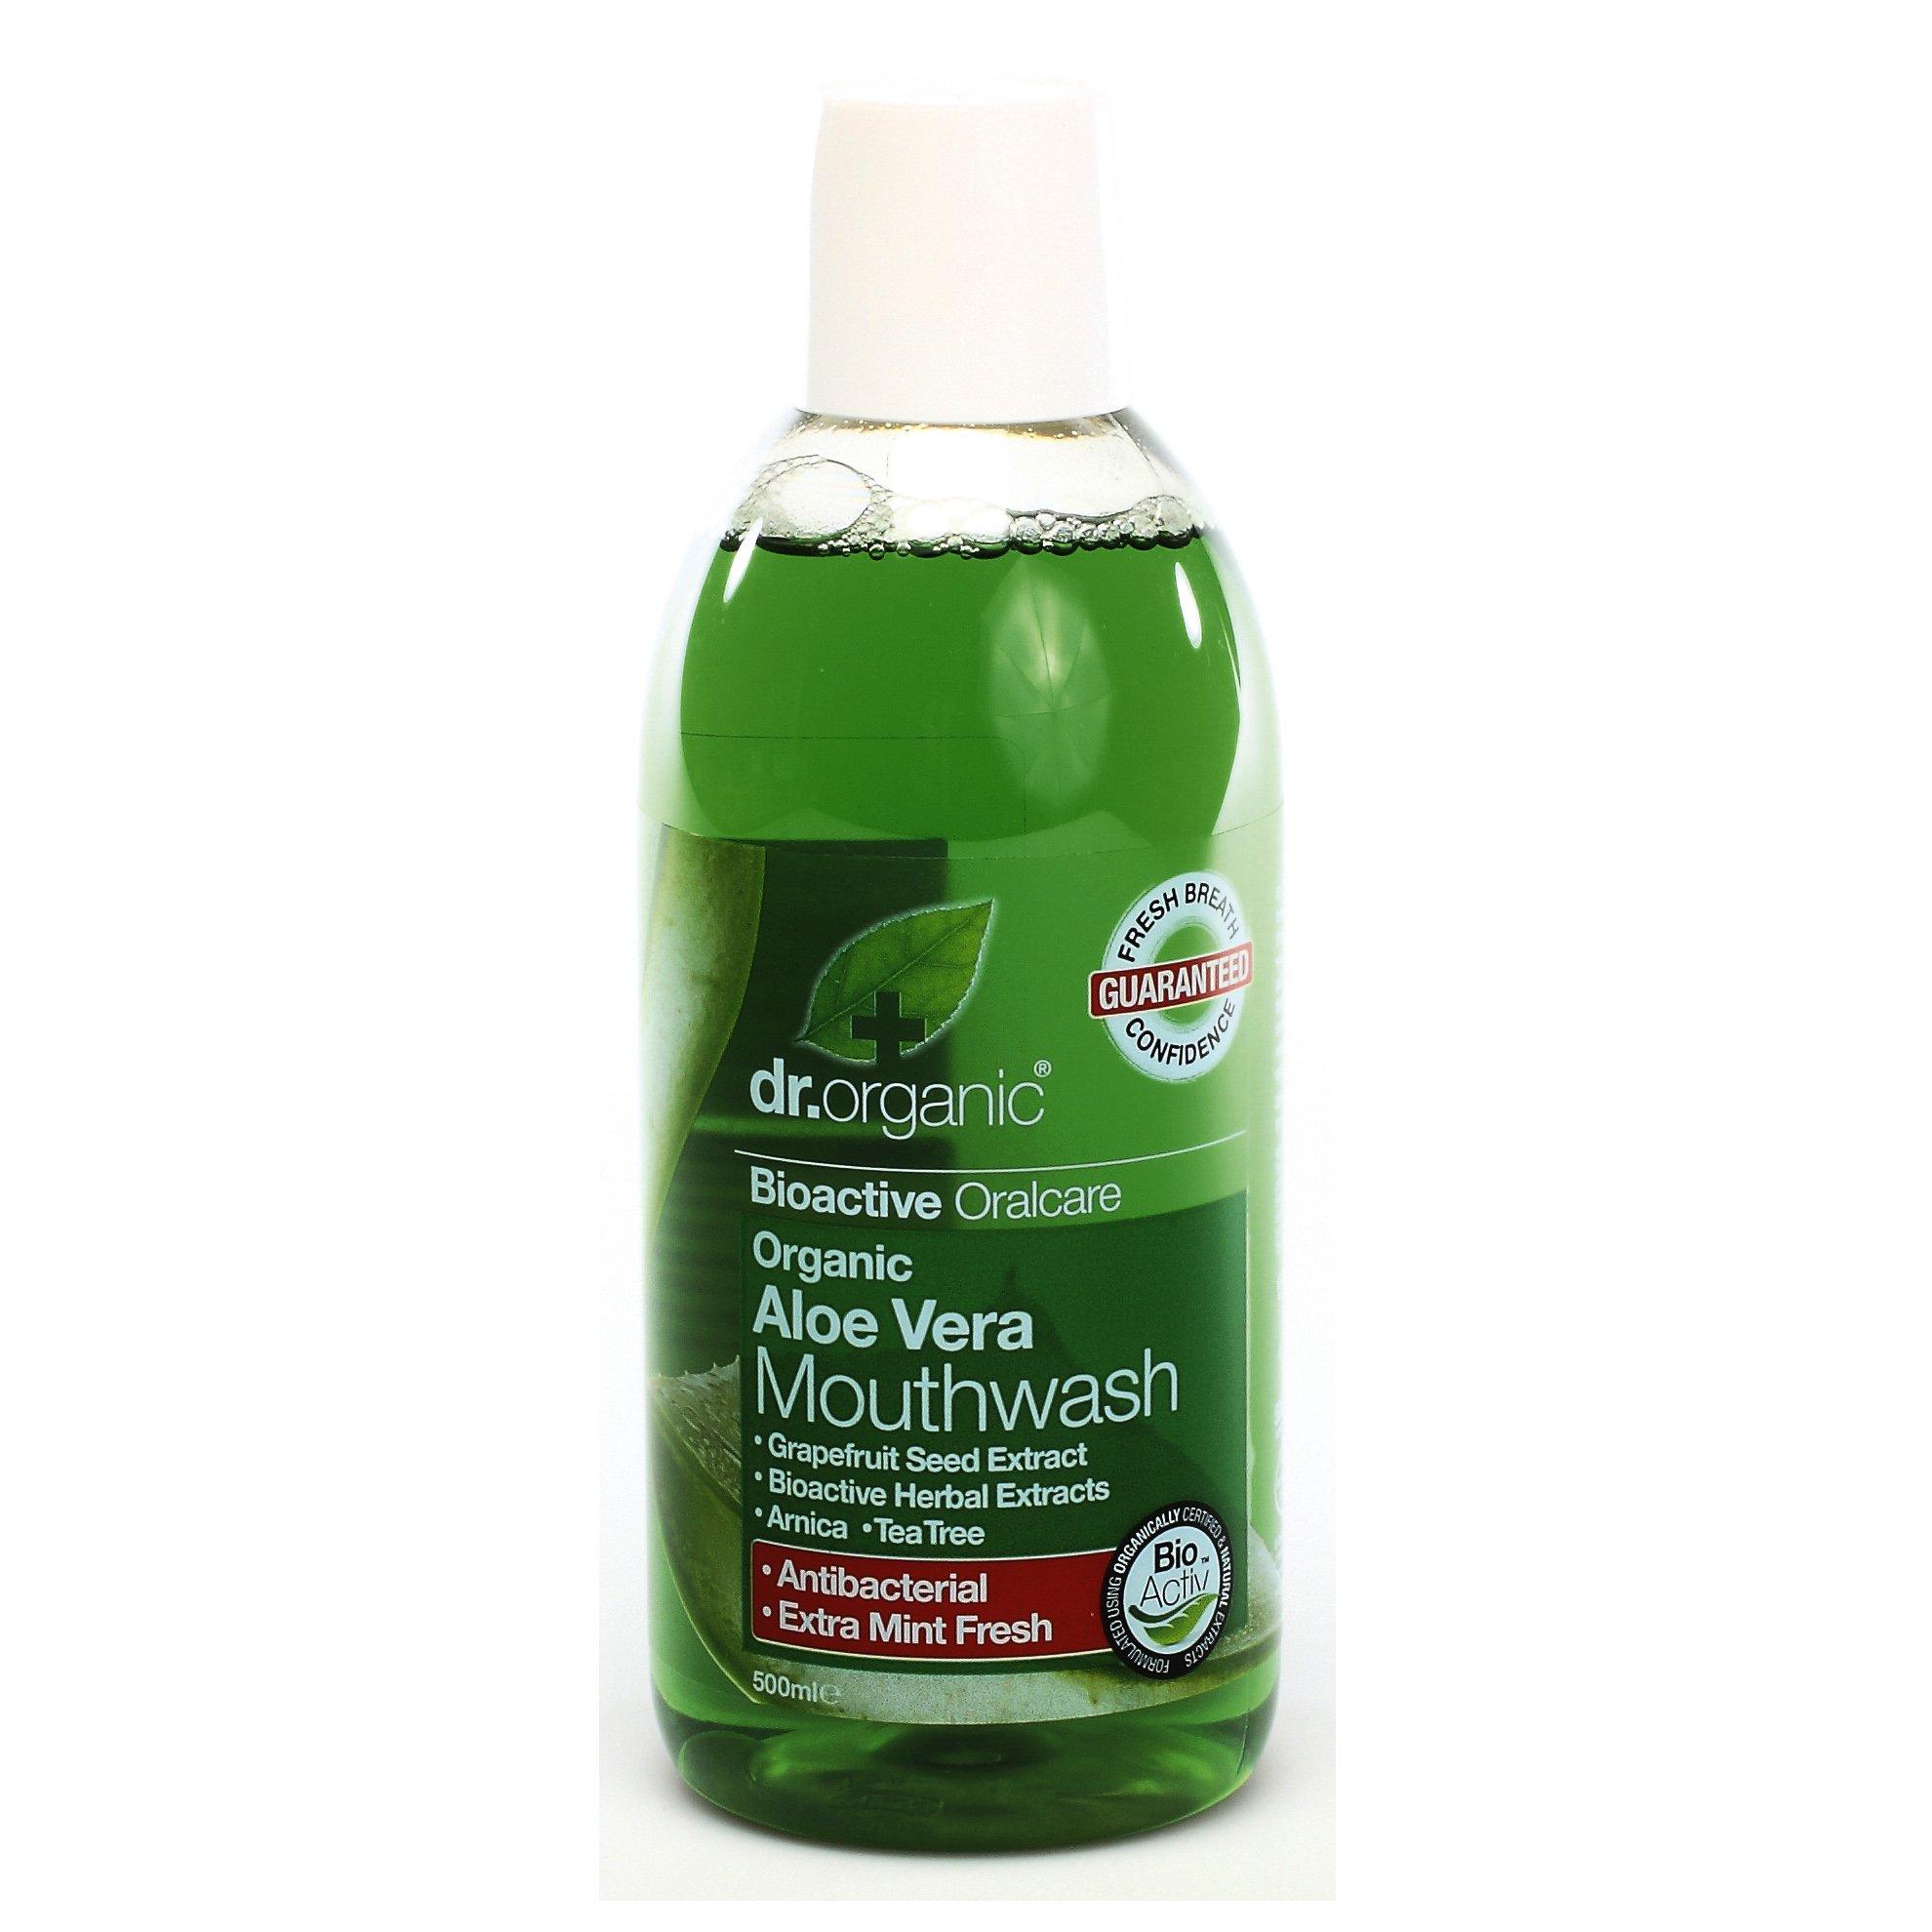 Dr Organic Organic Aloe Vera Mouthwash Στοματικό Διάλυμα με Βιολογική Αλόη Βέρα 500ml